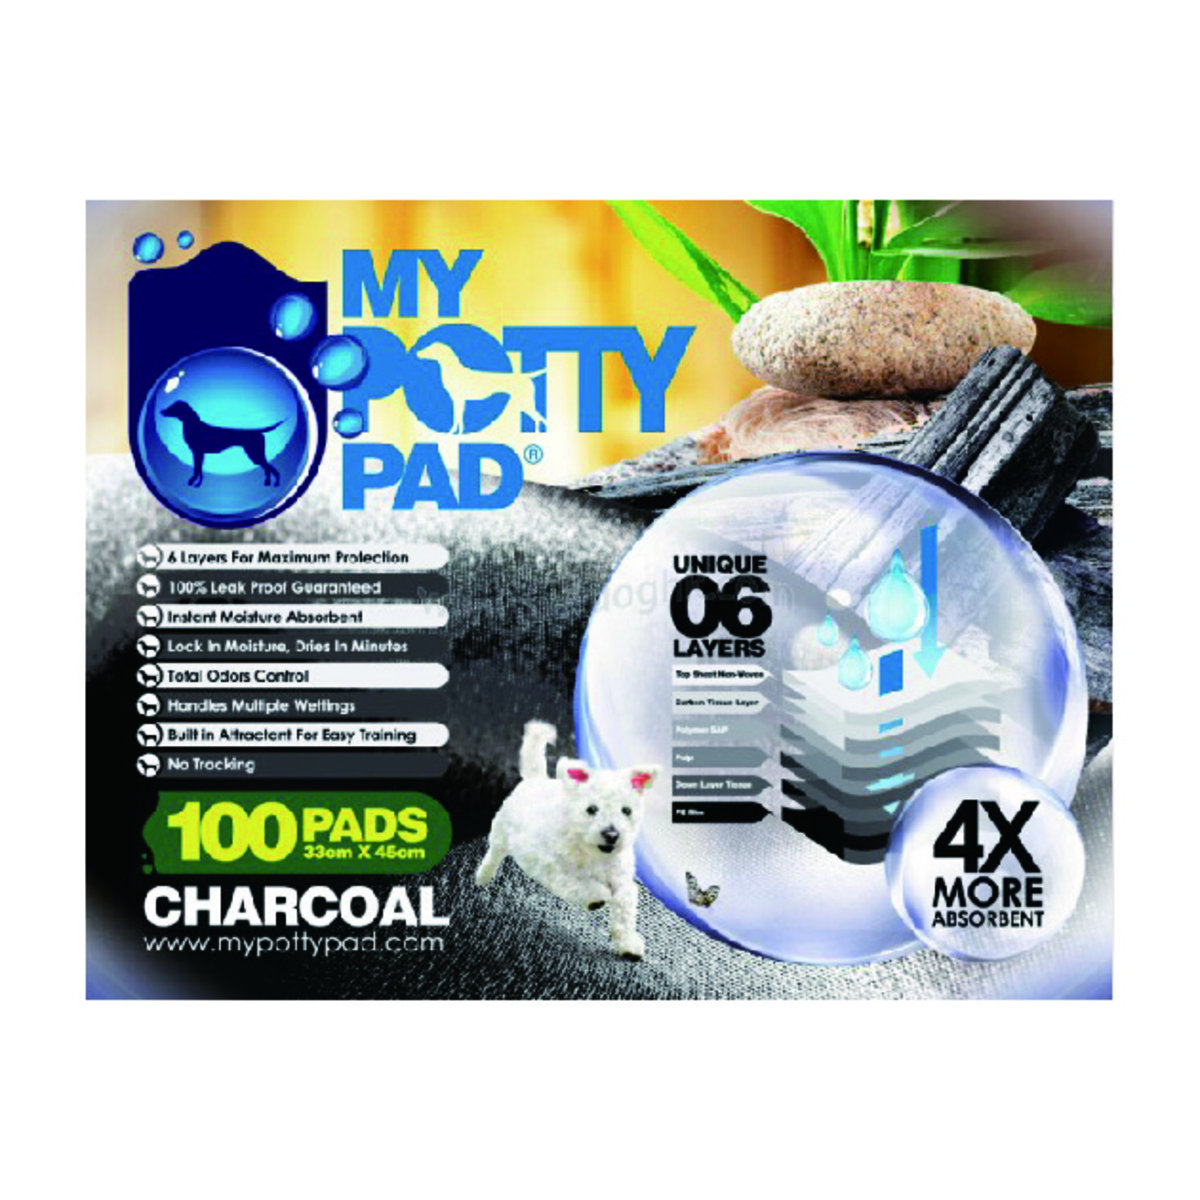 Charcoal寵物尿墊 33 cm x 45 cm